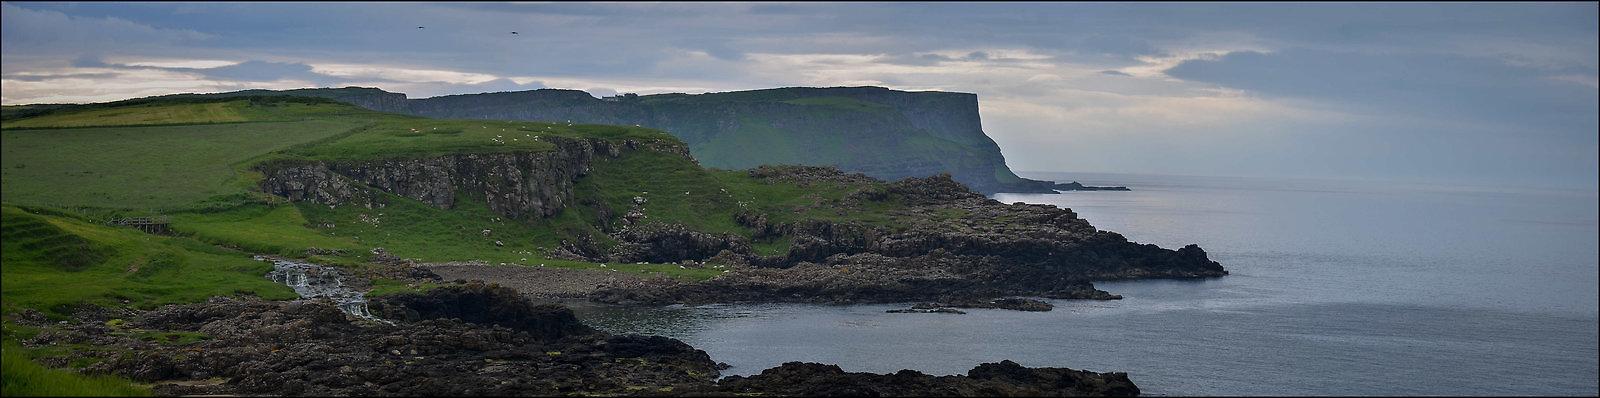 Ireland Dunseverick 2014 06 13 PG 021